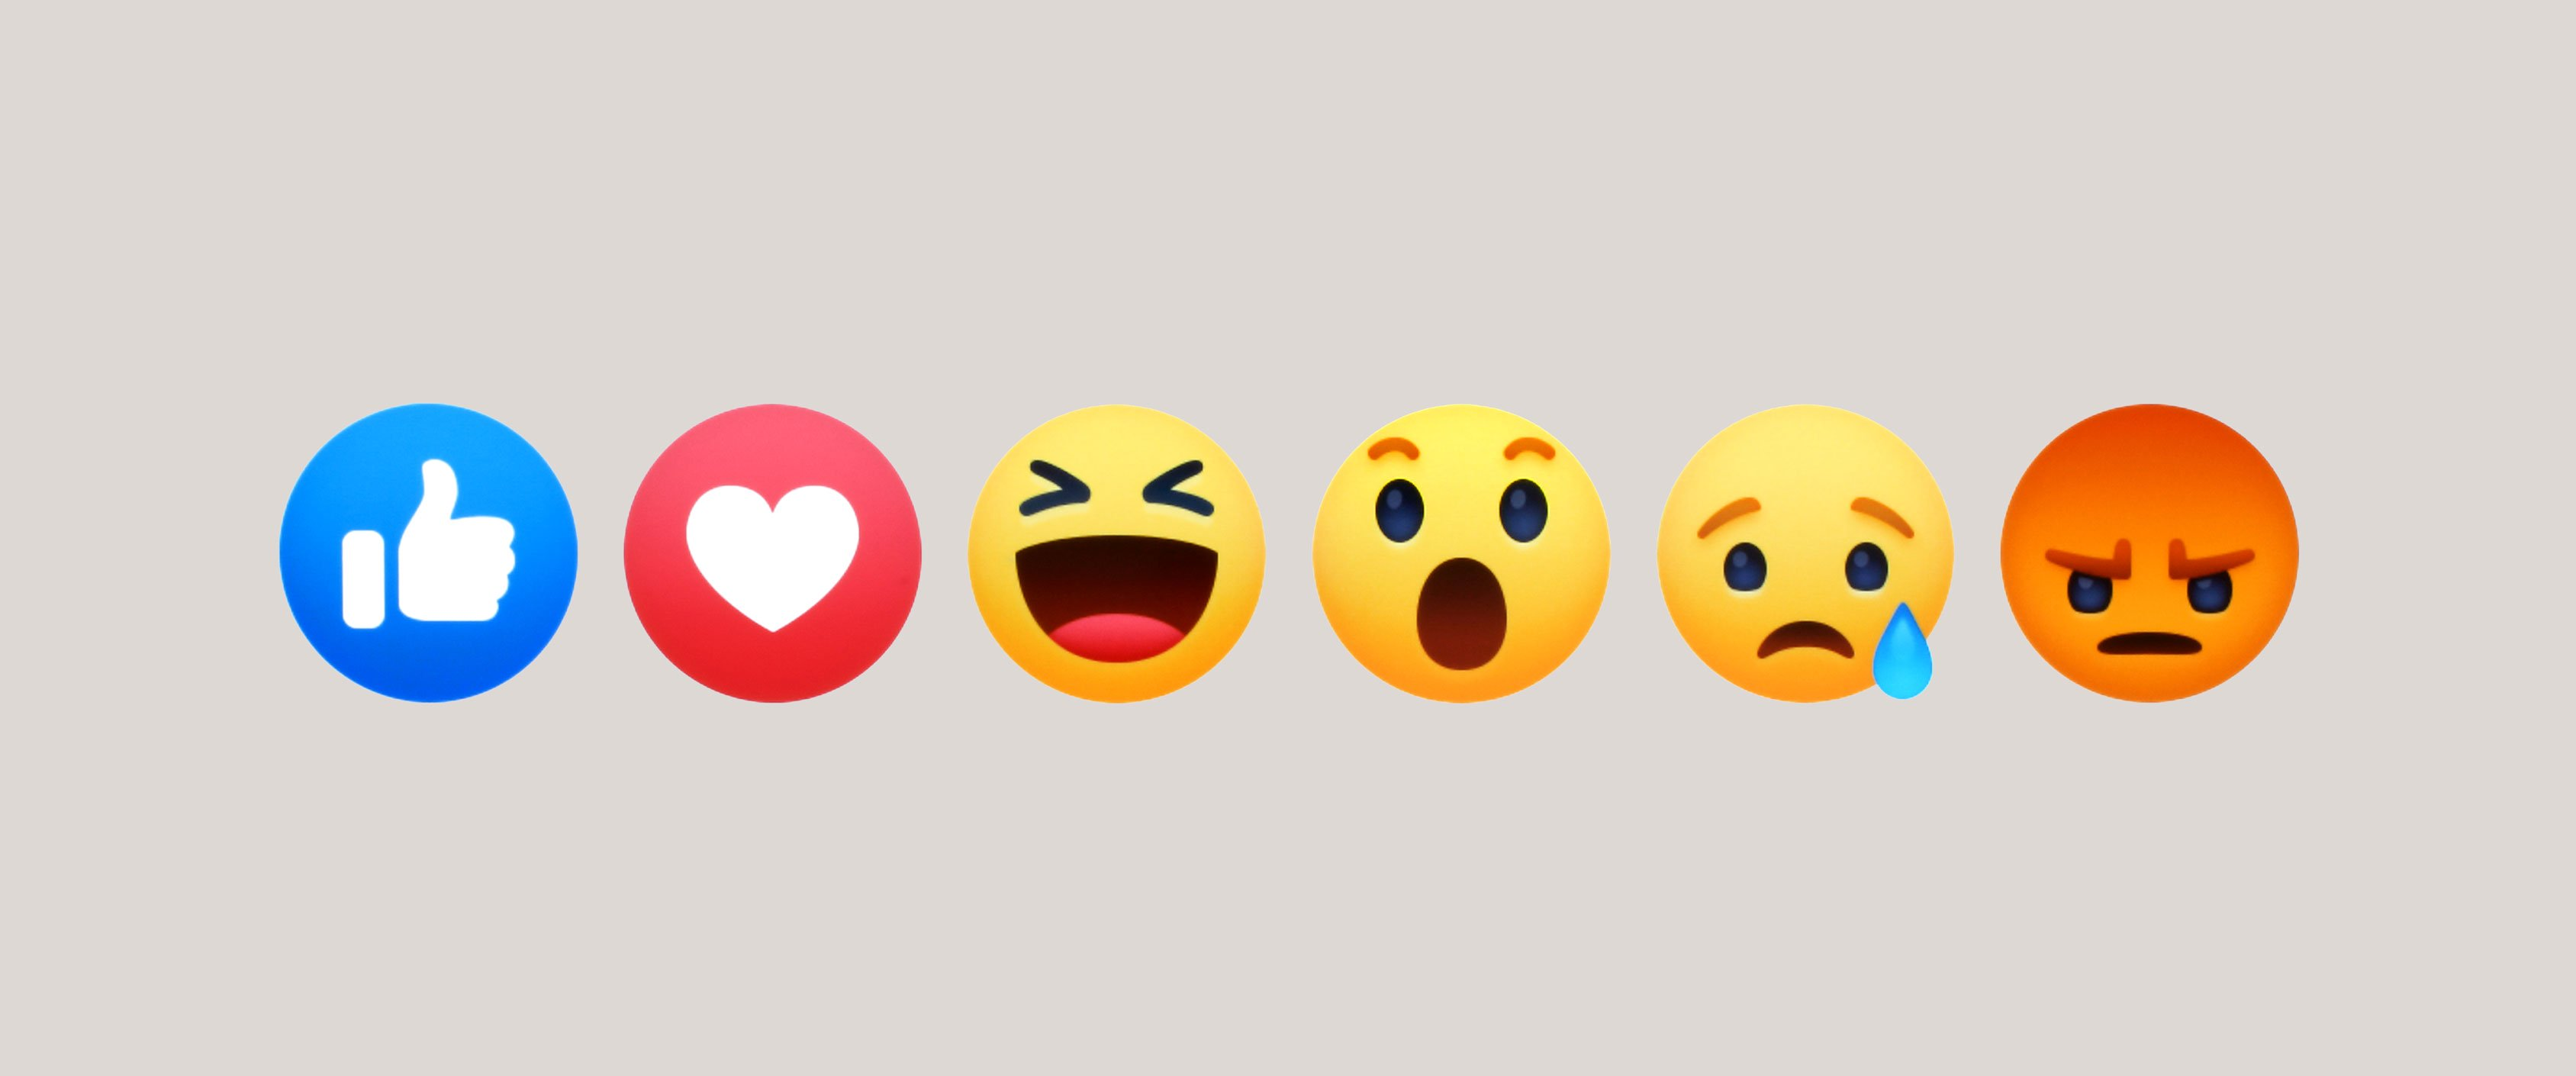 reactions on social media